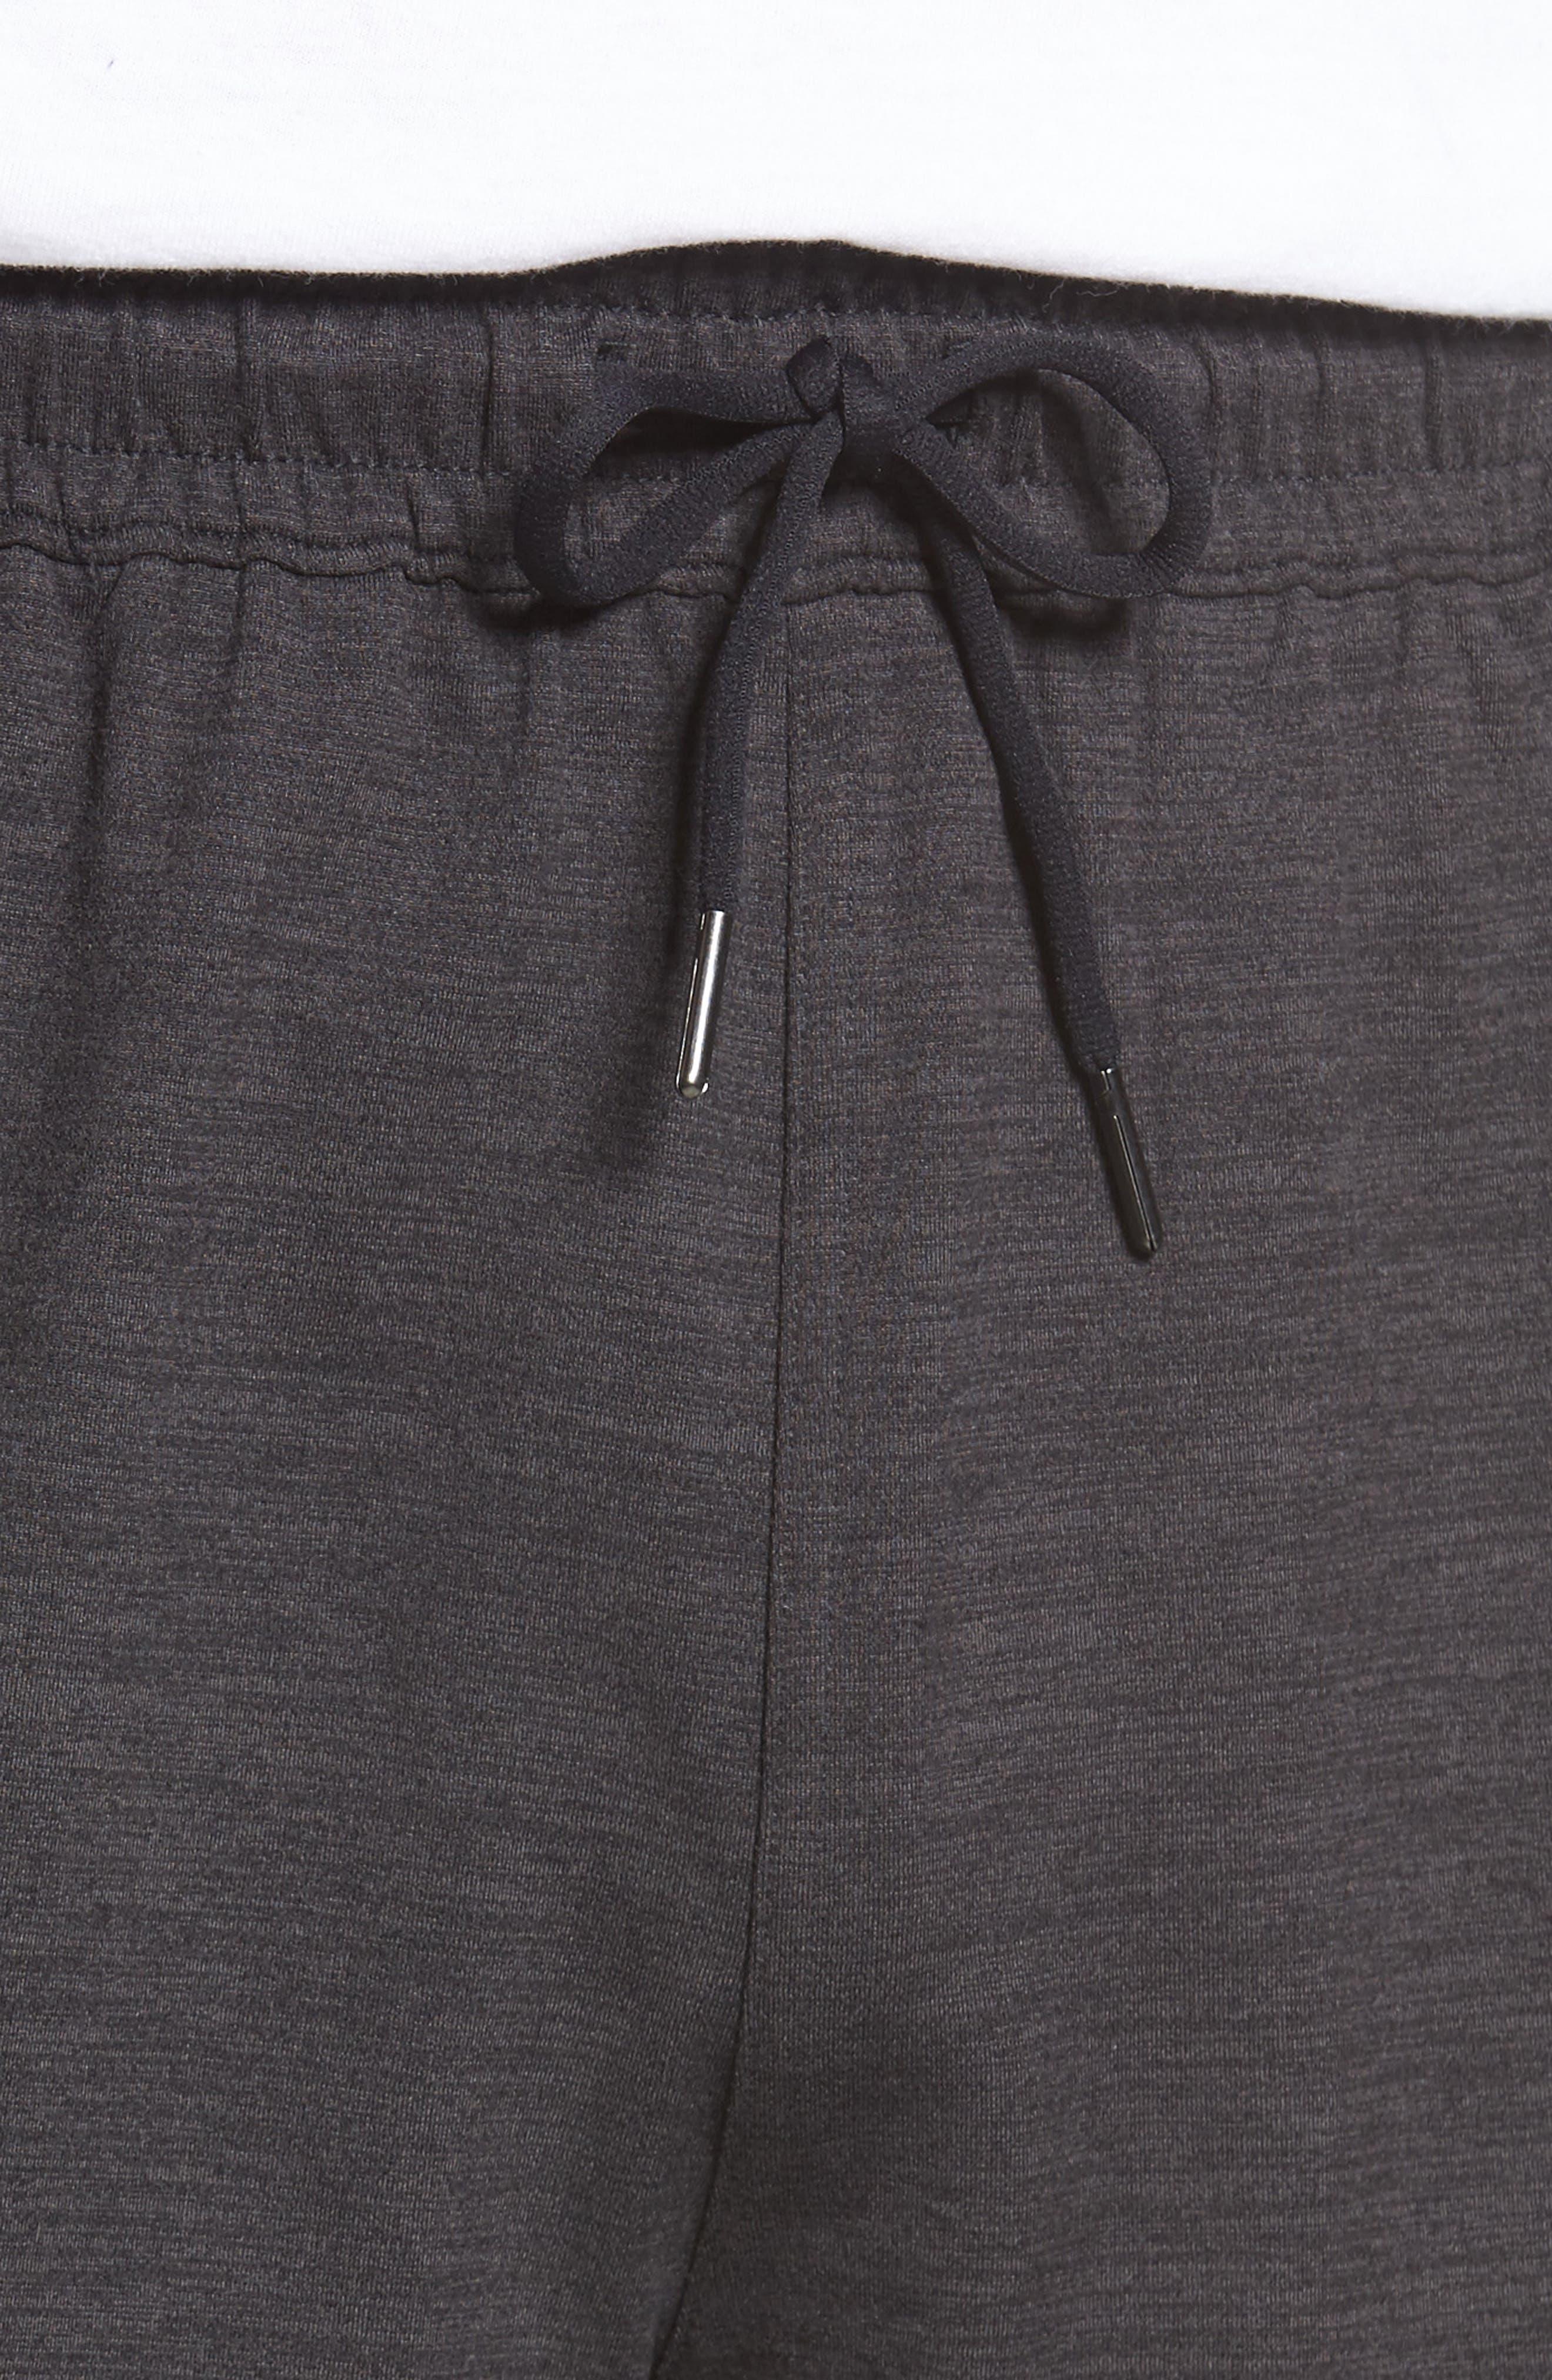 ZELLA,                             Pyrite Knit Shorts,                             Alternate thumbnail 4, color,                             BLACK OXIDE MELANGE